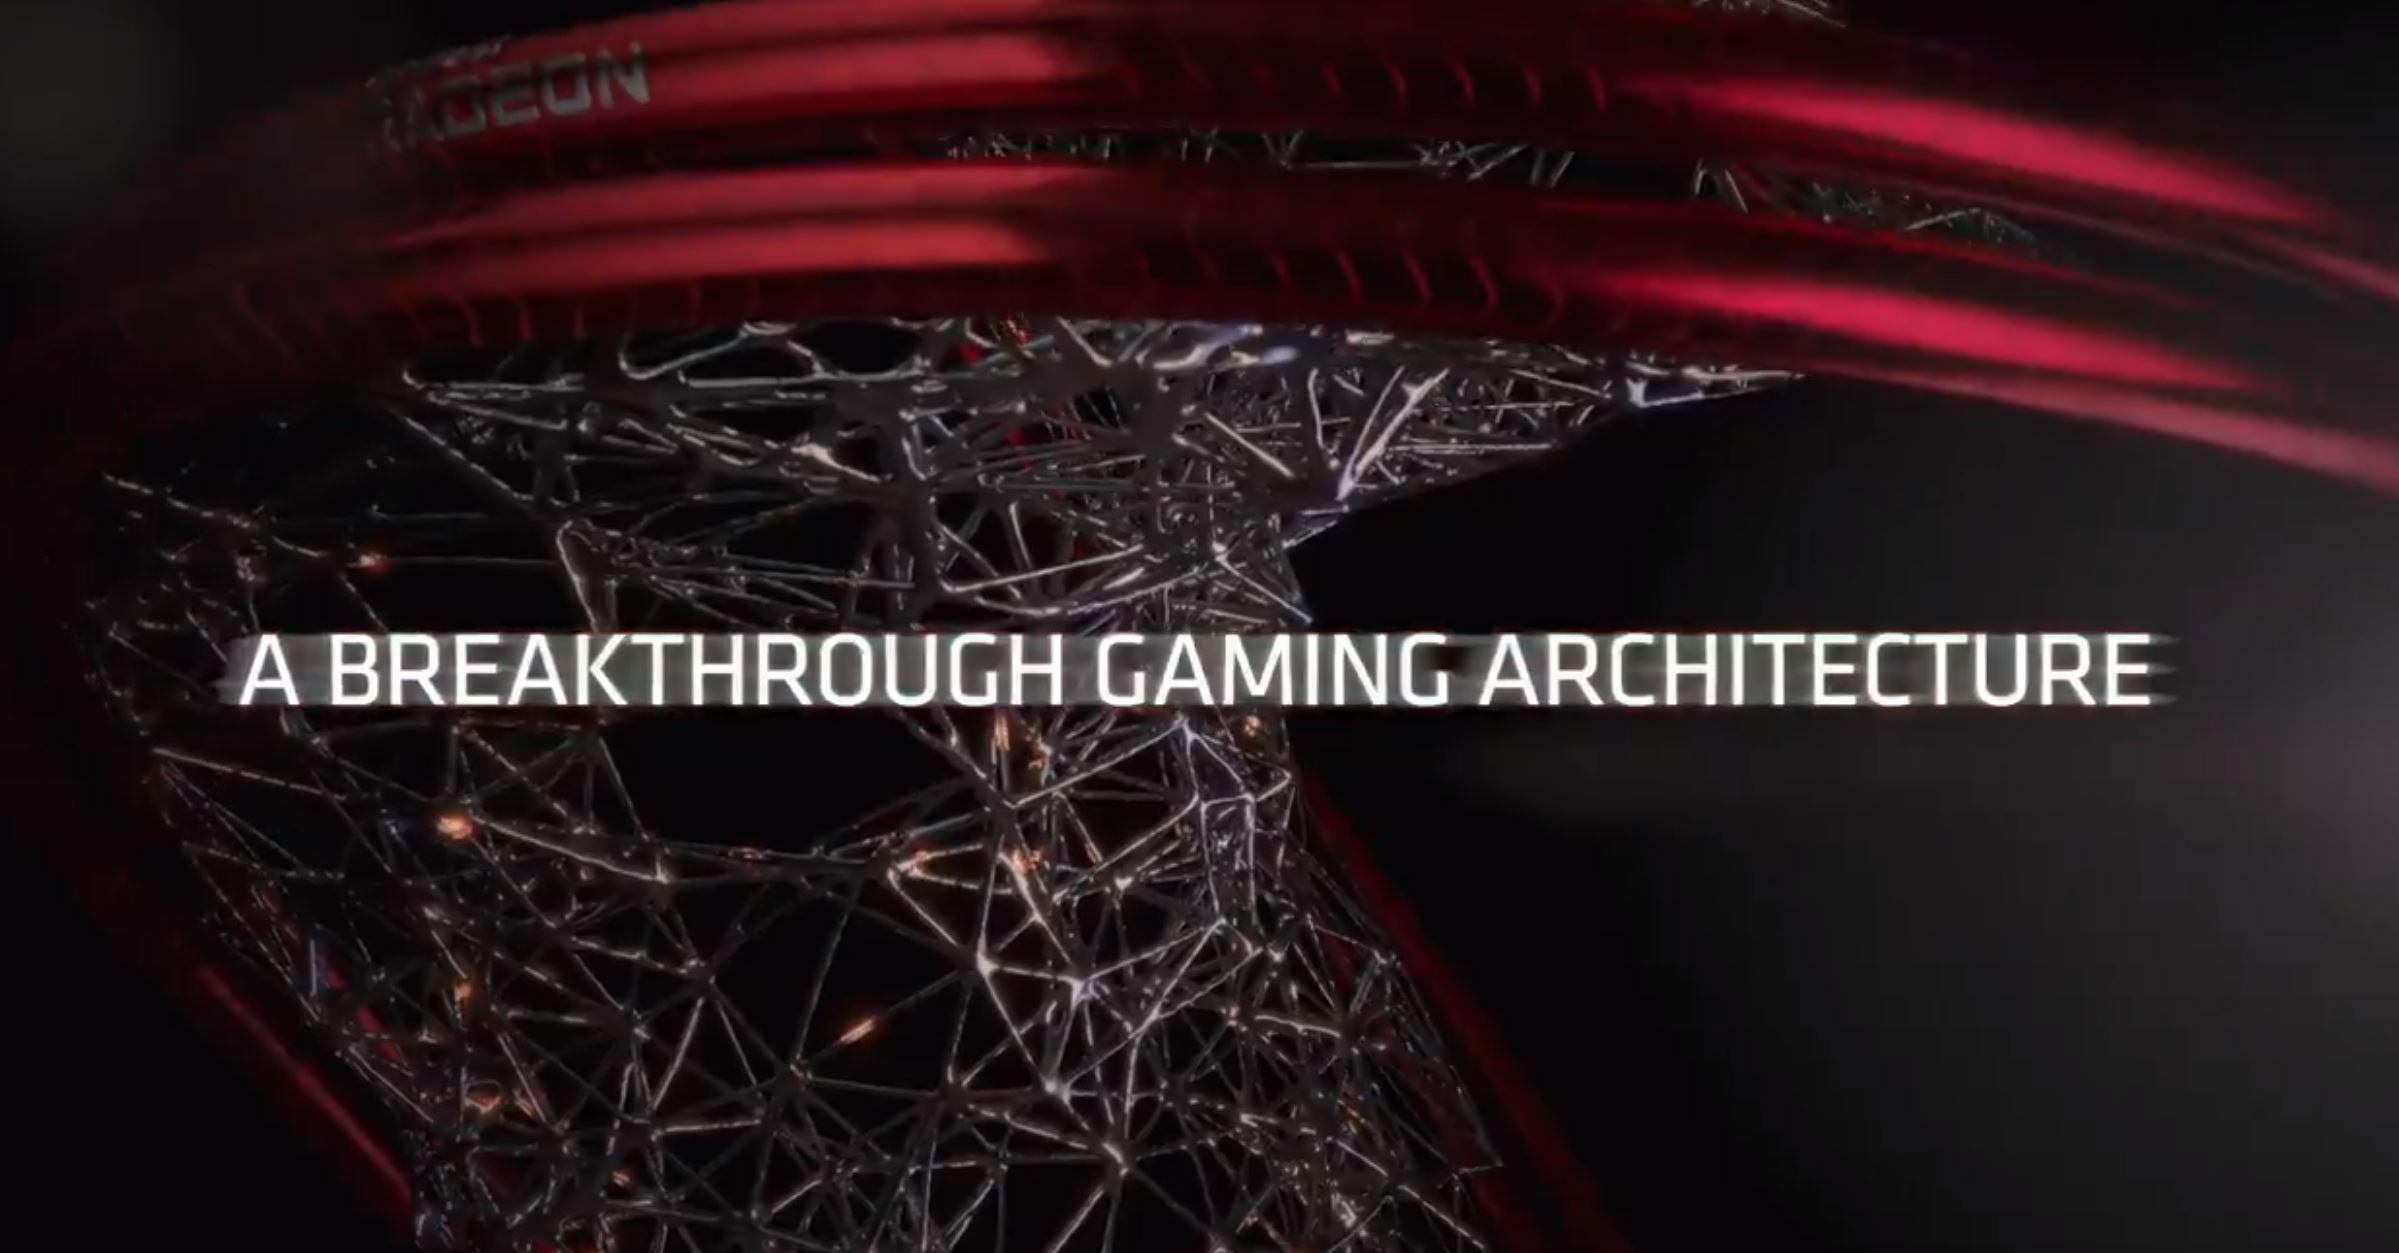 Amd To Introduce Zen3 On October 8 Radeon Rx 6000 Series On October 28 Videocardz Com